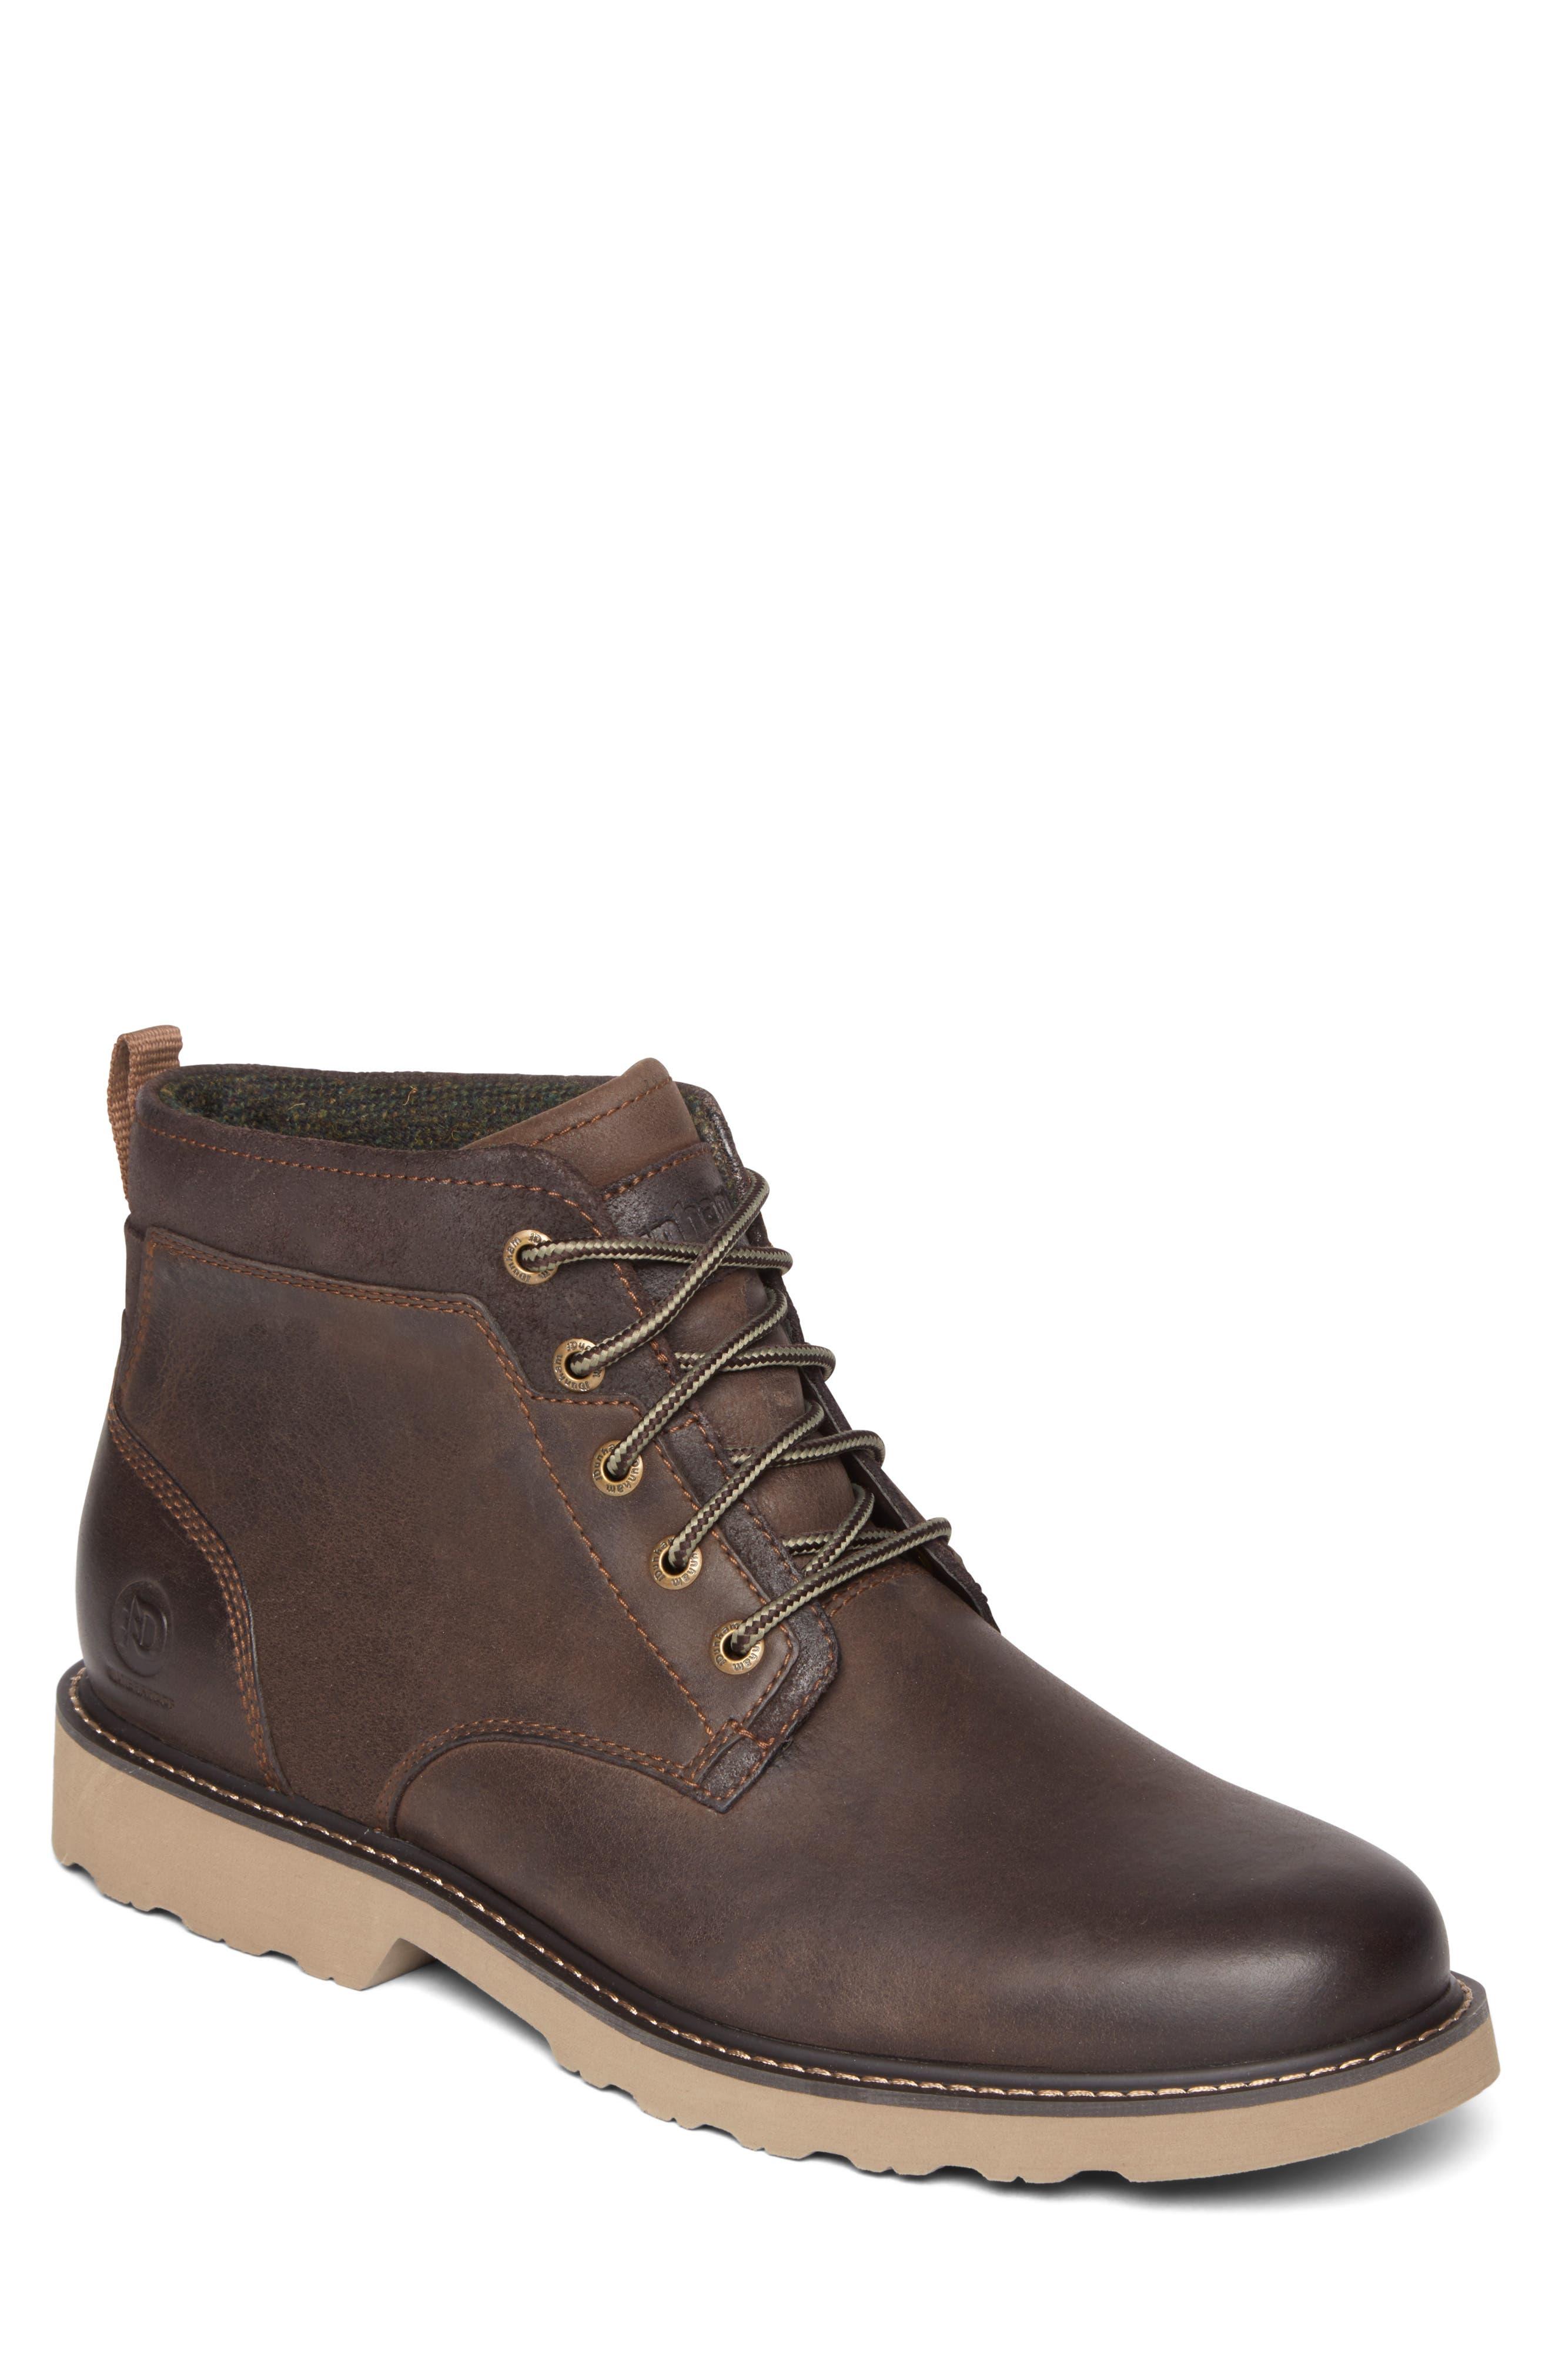 Jake Waterproof Boot